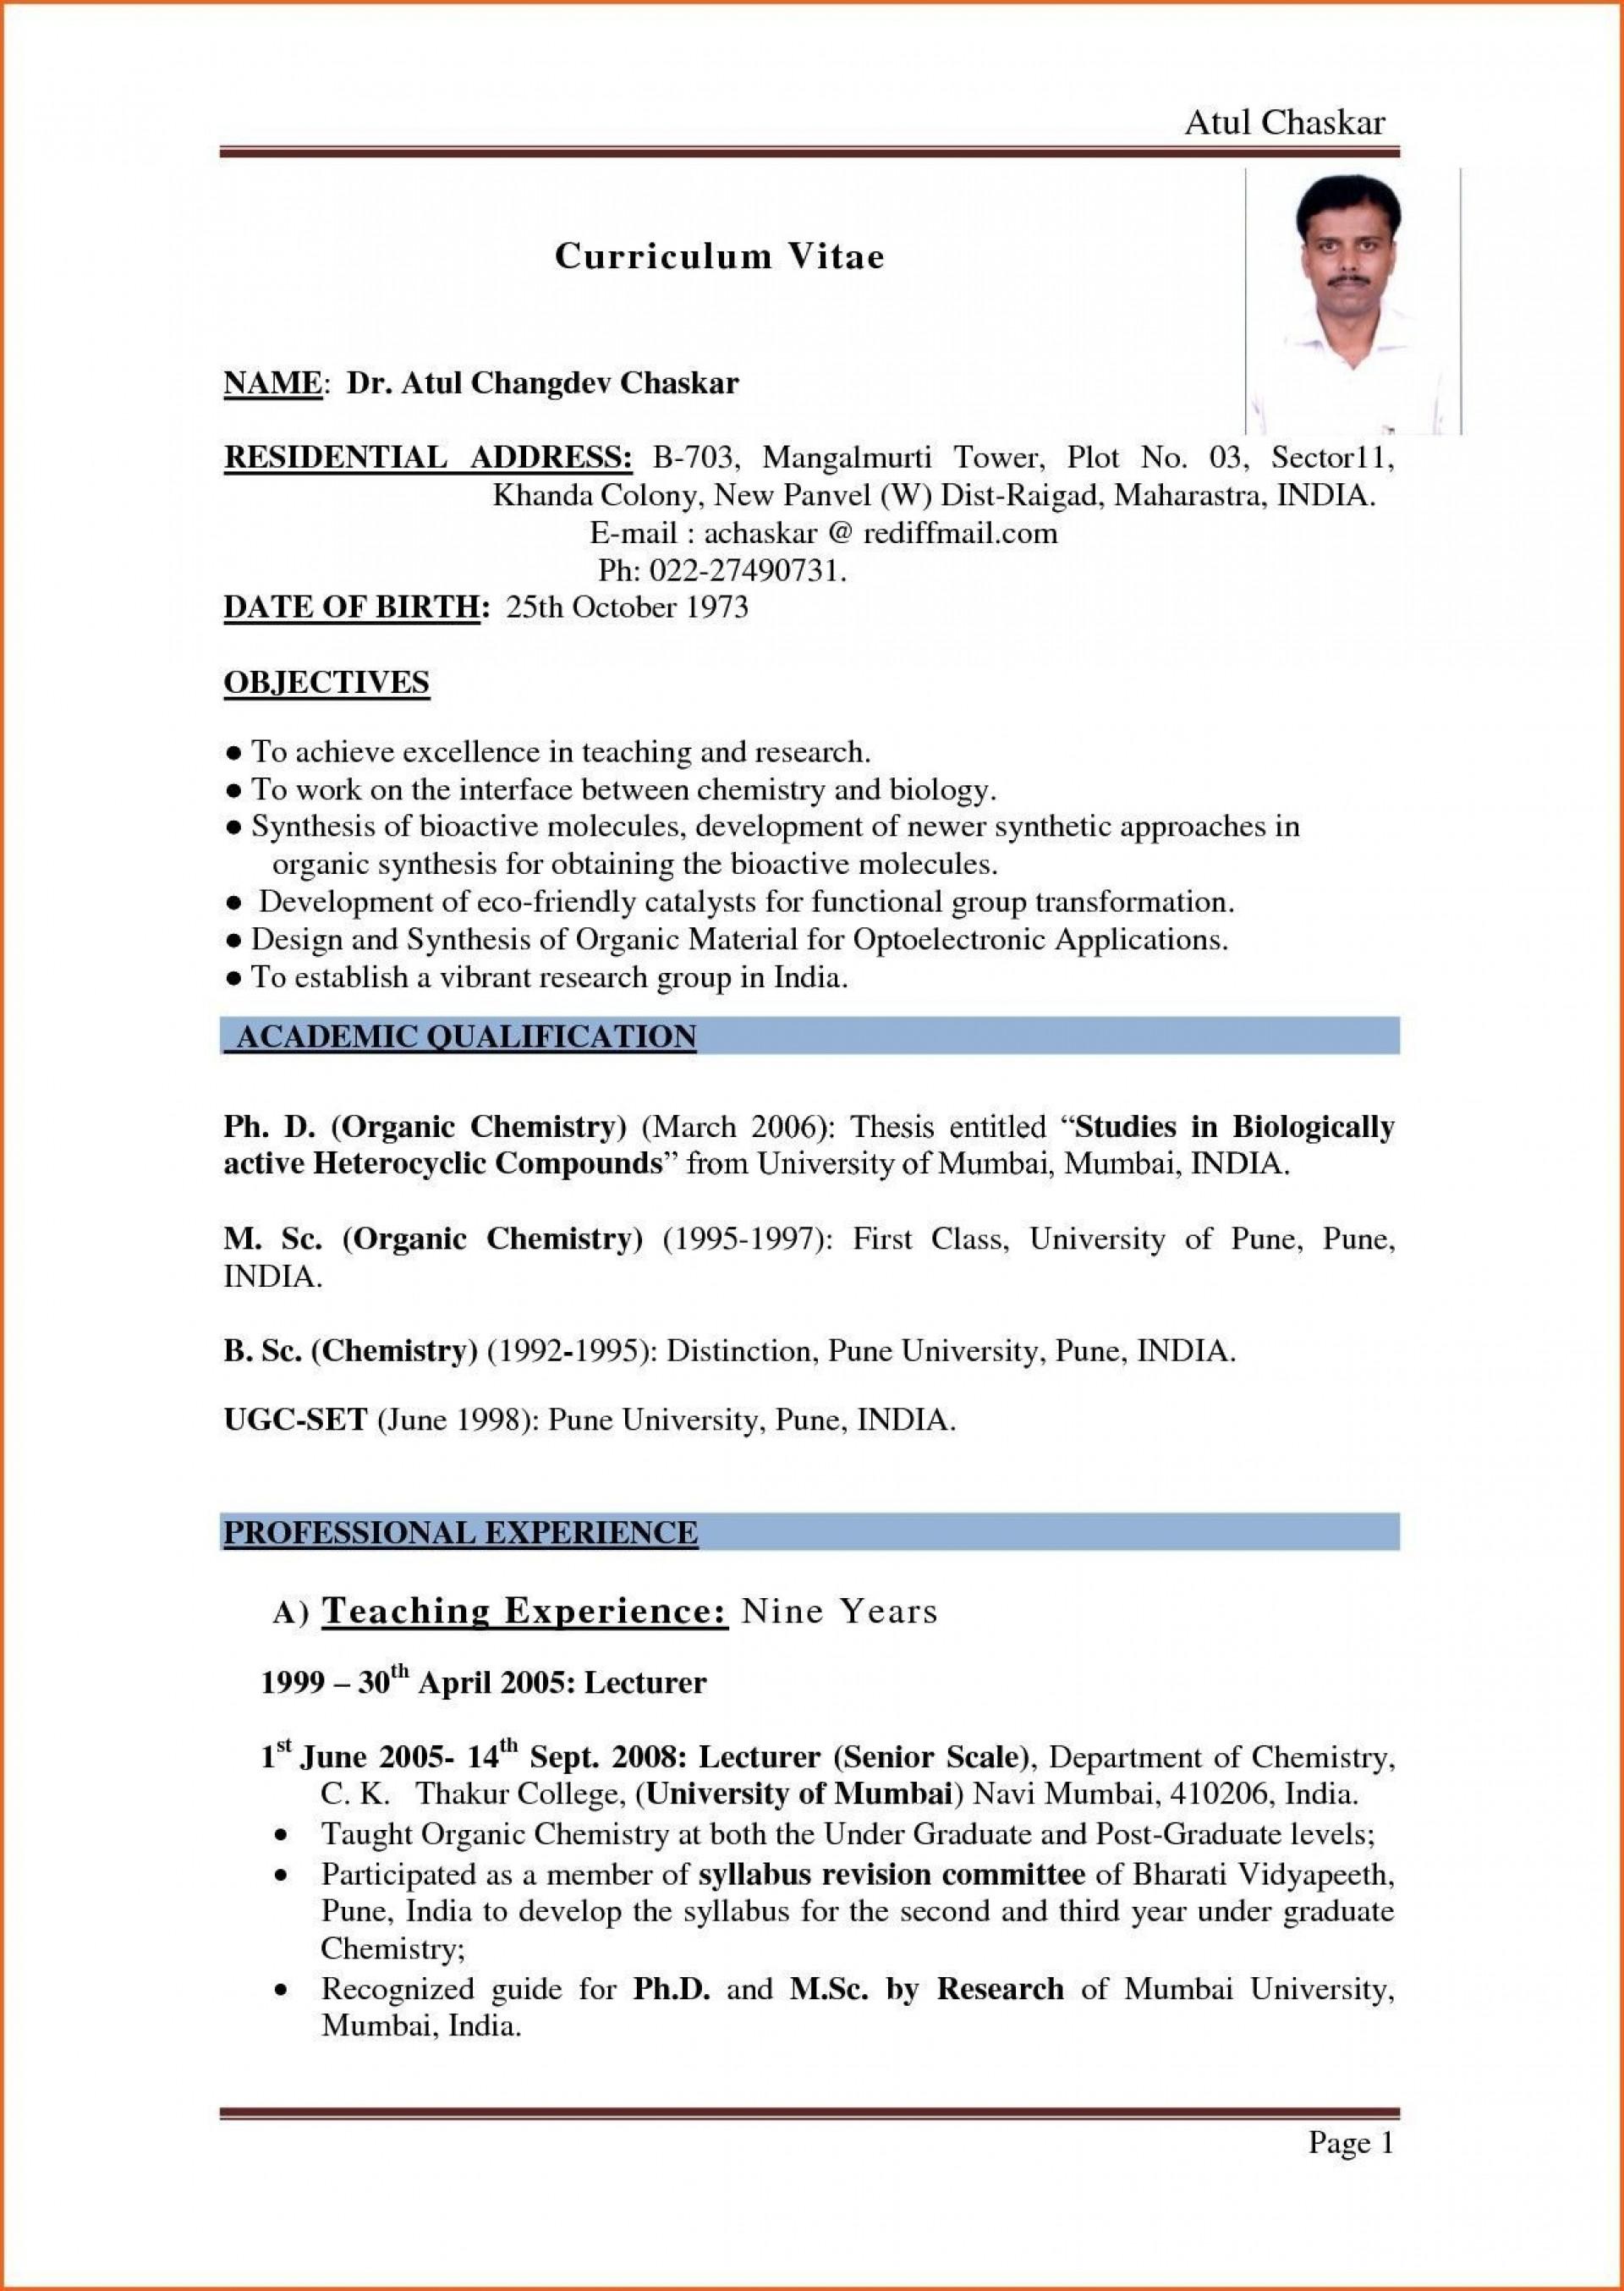 003 Singular Resume Sample For Teaching Job In India Image  School Principal Position1920